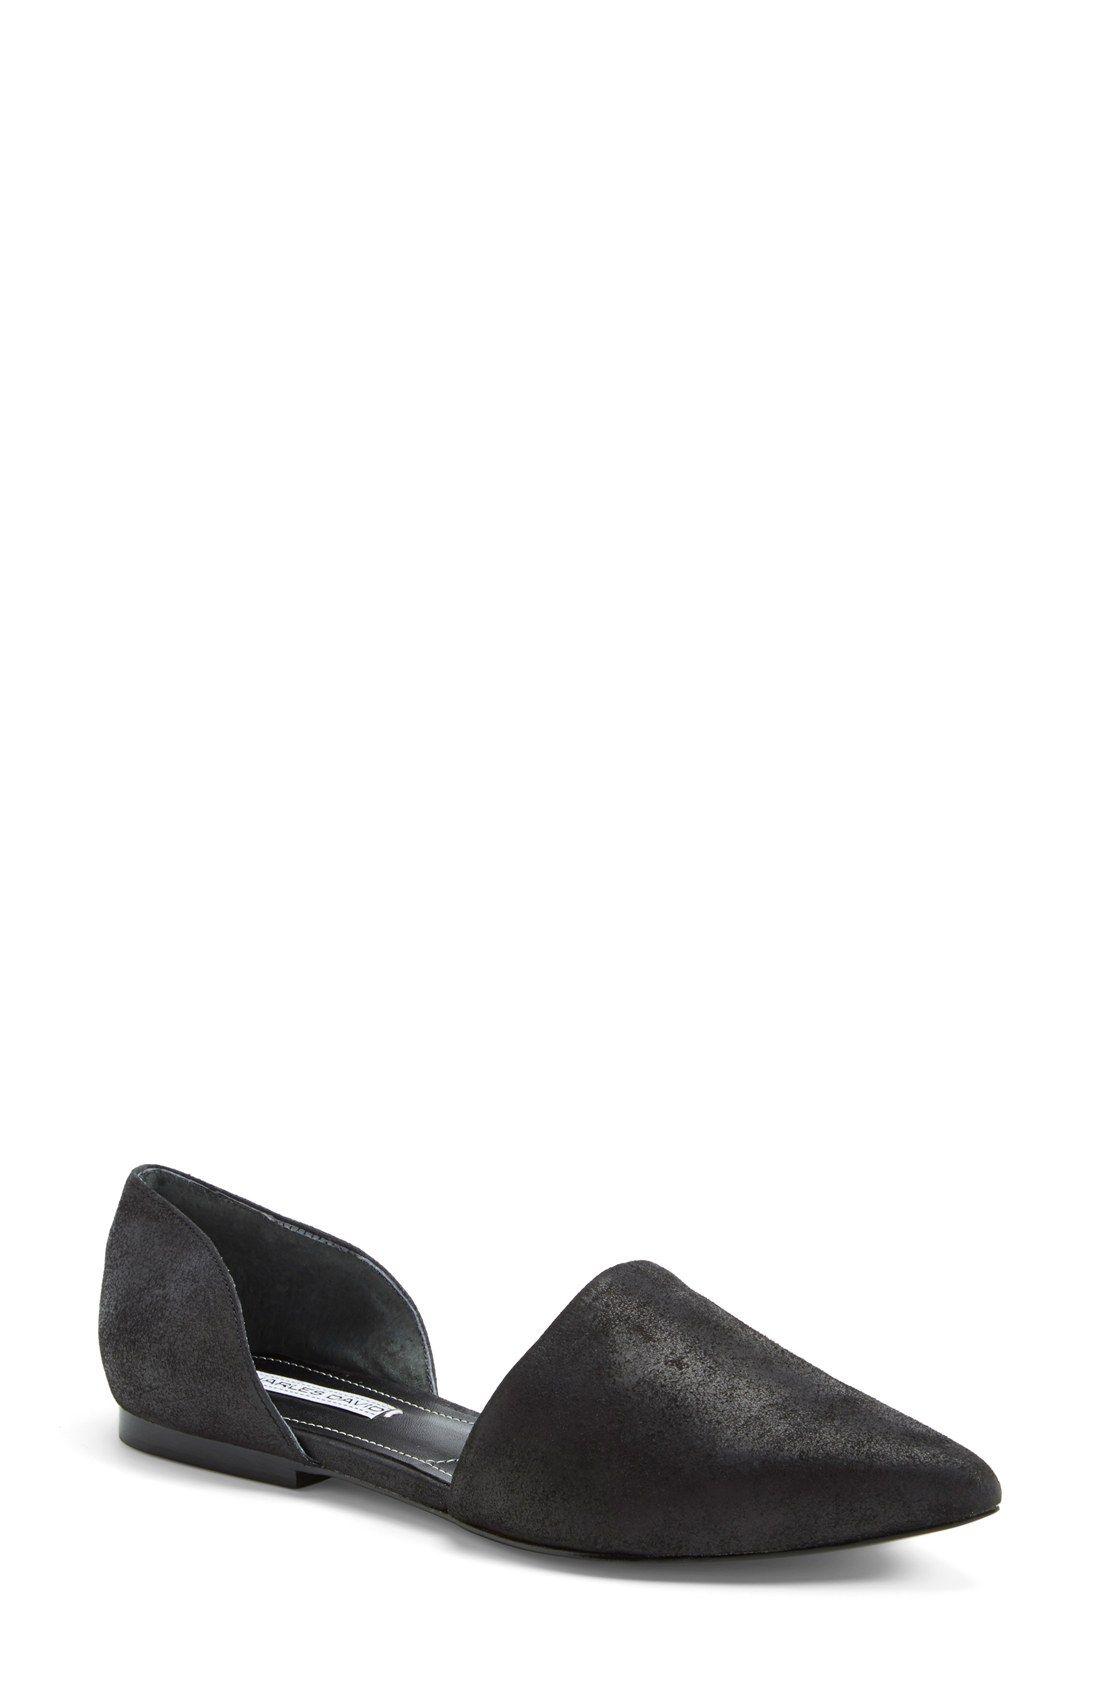 Womens Flats Charles David Womens Kitty Dorsay Flats Flats black leather Under Discount